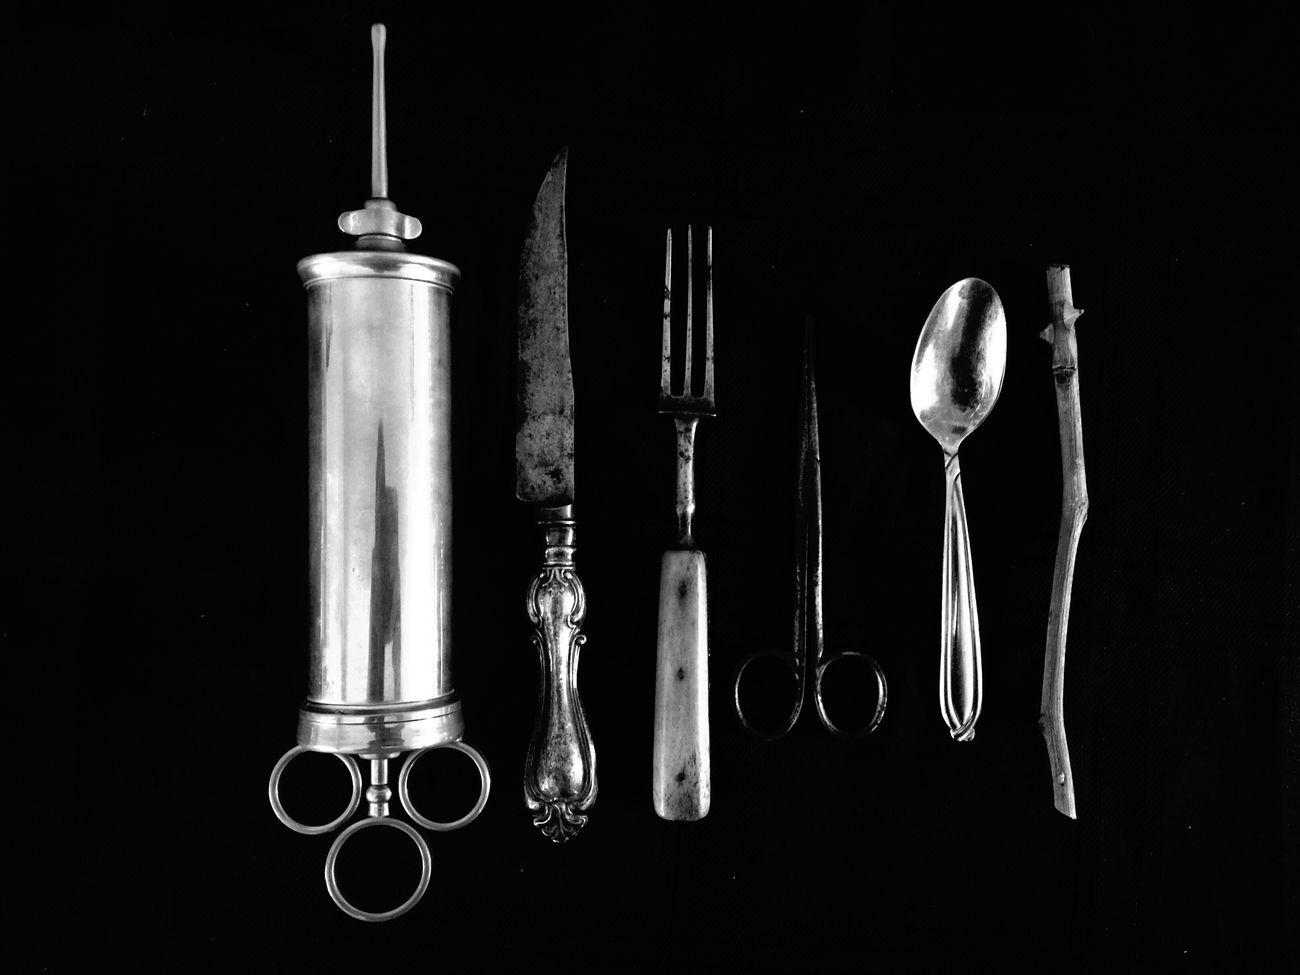 The Hierarchy of Cutlery ProCamera - Shots Of The Year 2014 NEM Black&white NEM Still Life